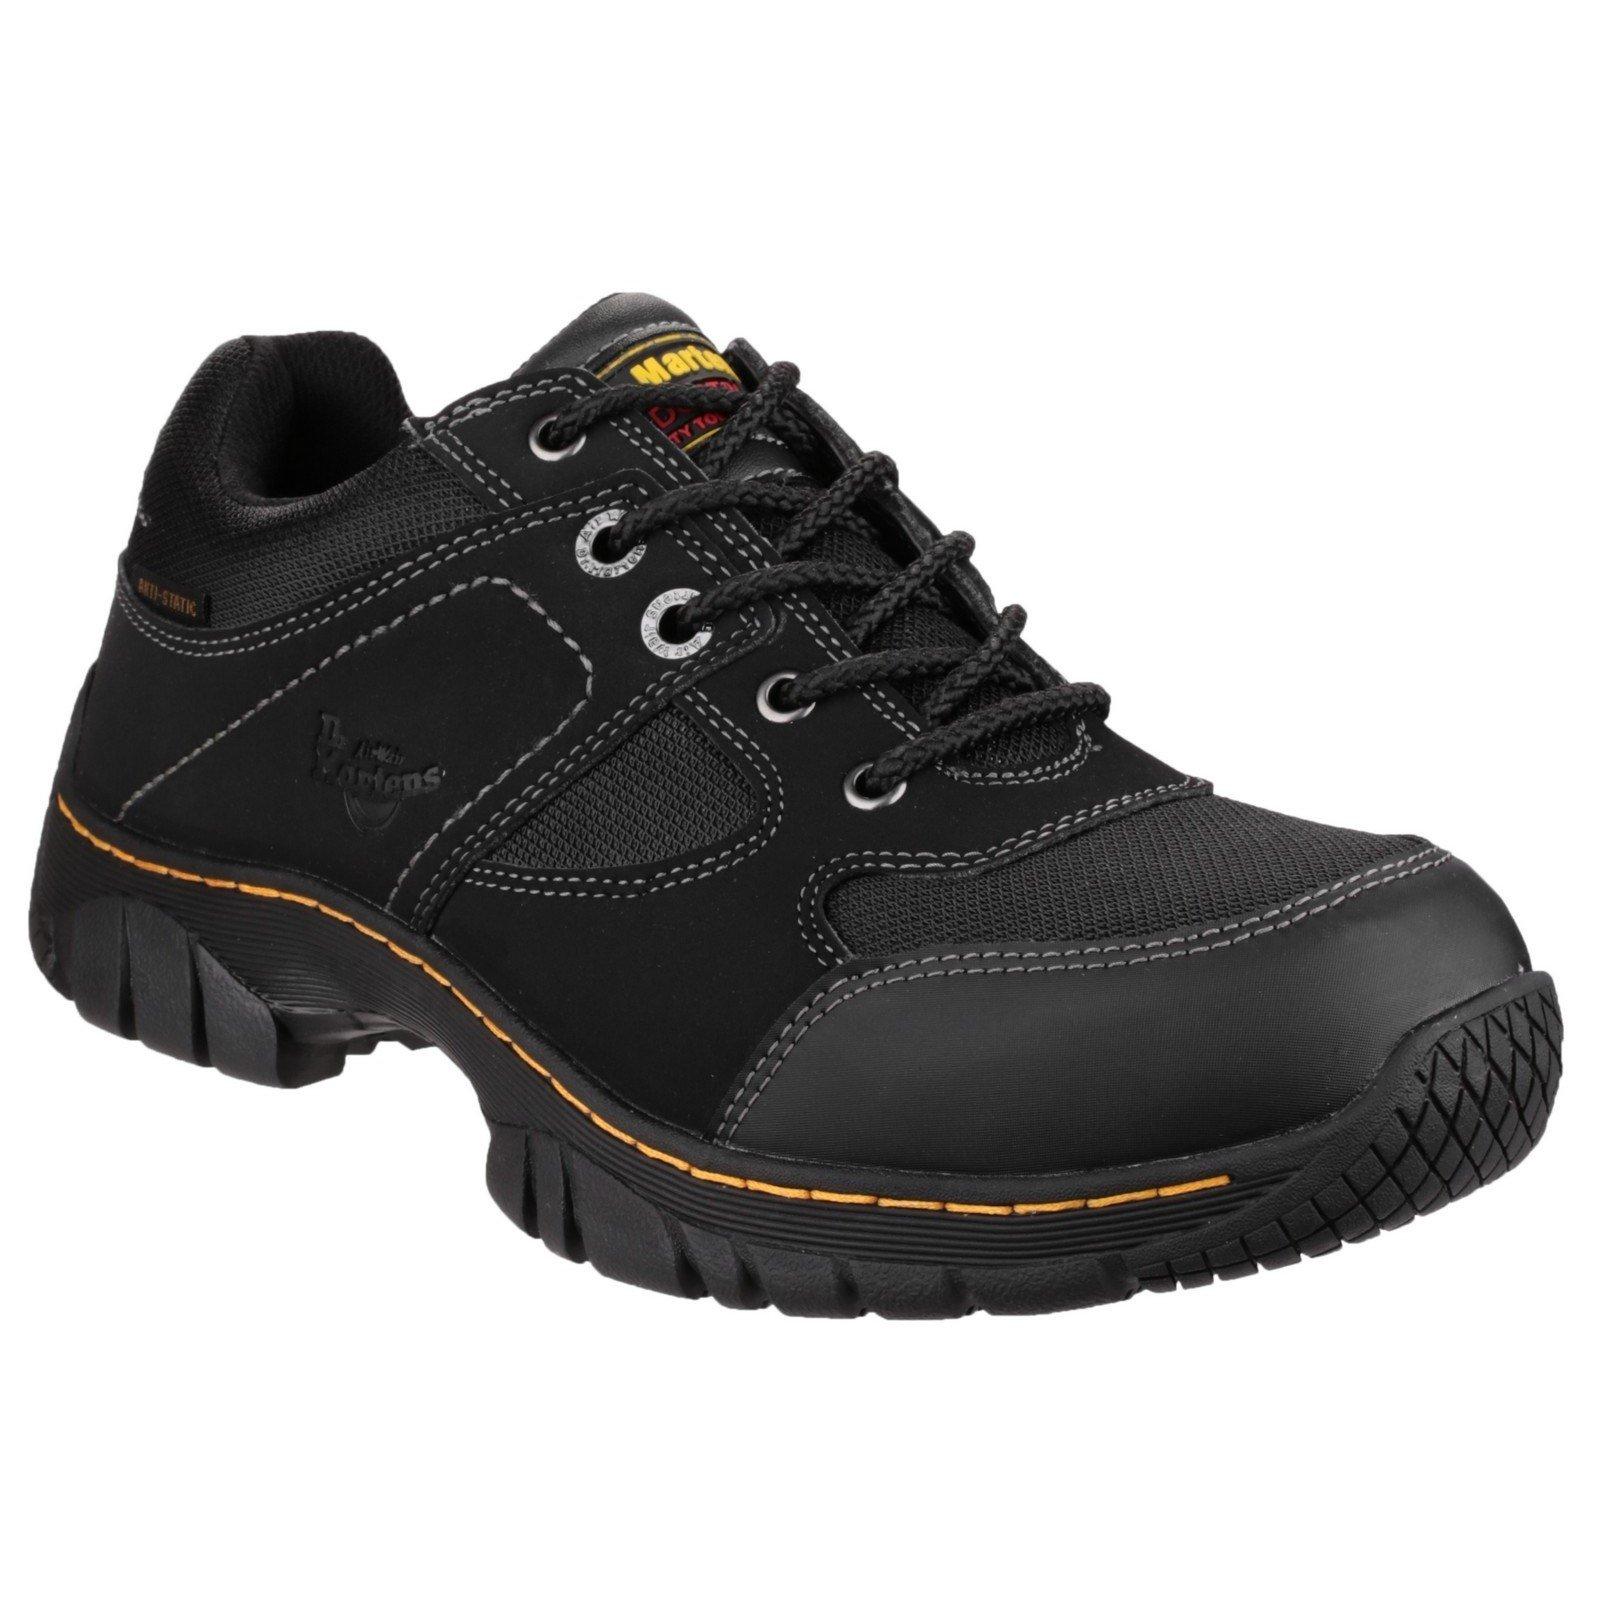 Dr Martens Unisex Gunaldo Safety Trainer Black 21648 - Black 12